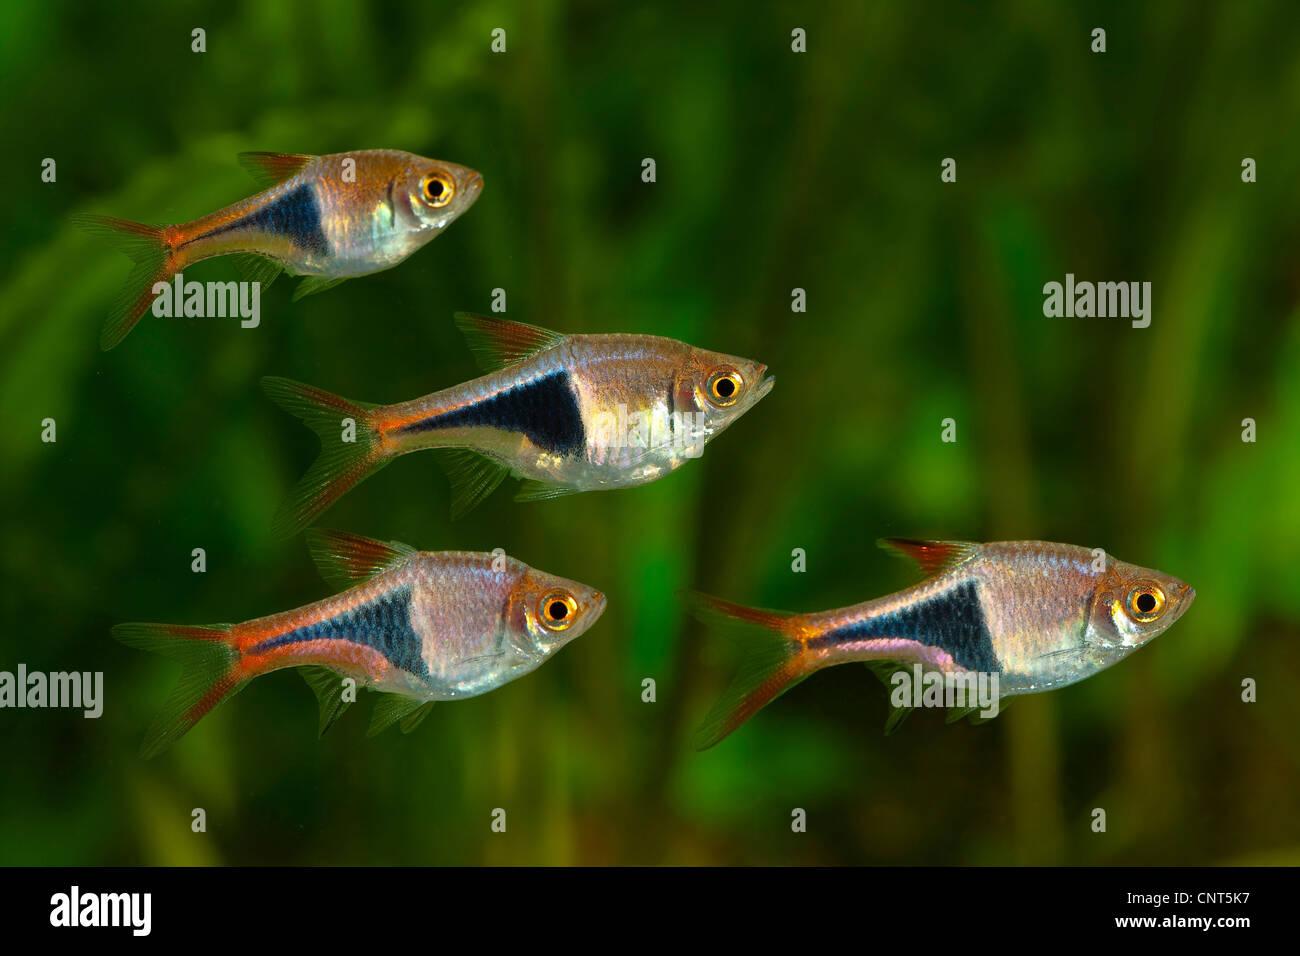 Freshwater aquarium fish rasbora - Stock Photo Harlequin Fish Harlequin Rasbora Rasbora Heteromorpha Little Shoal